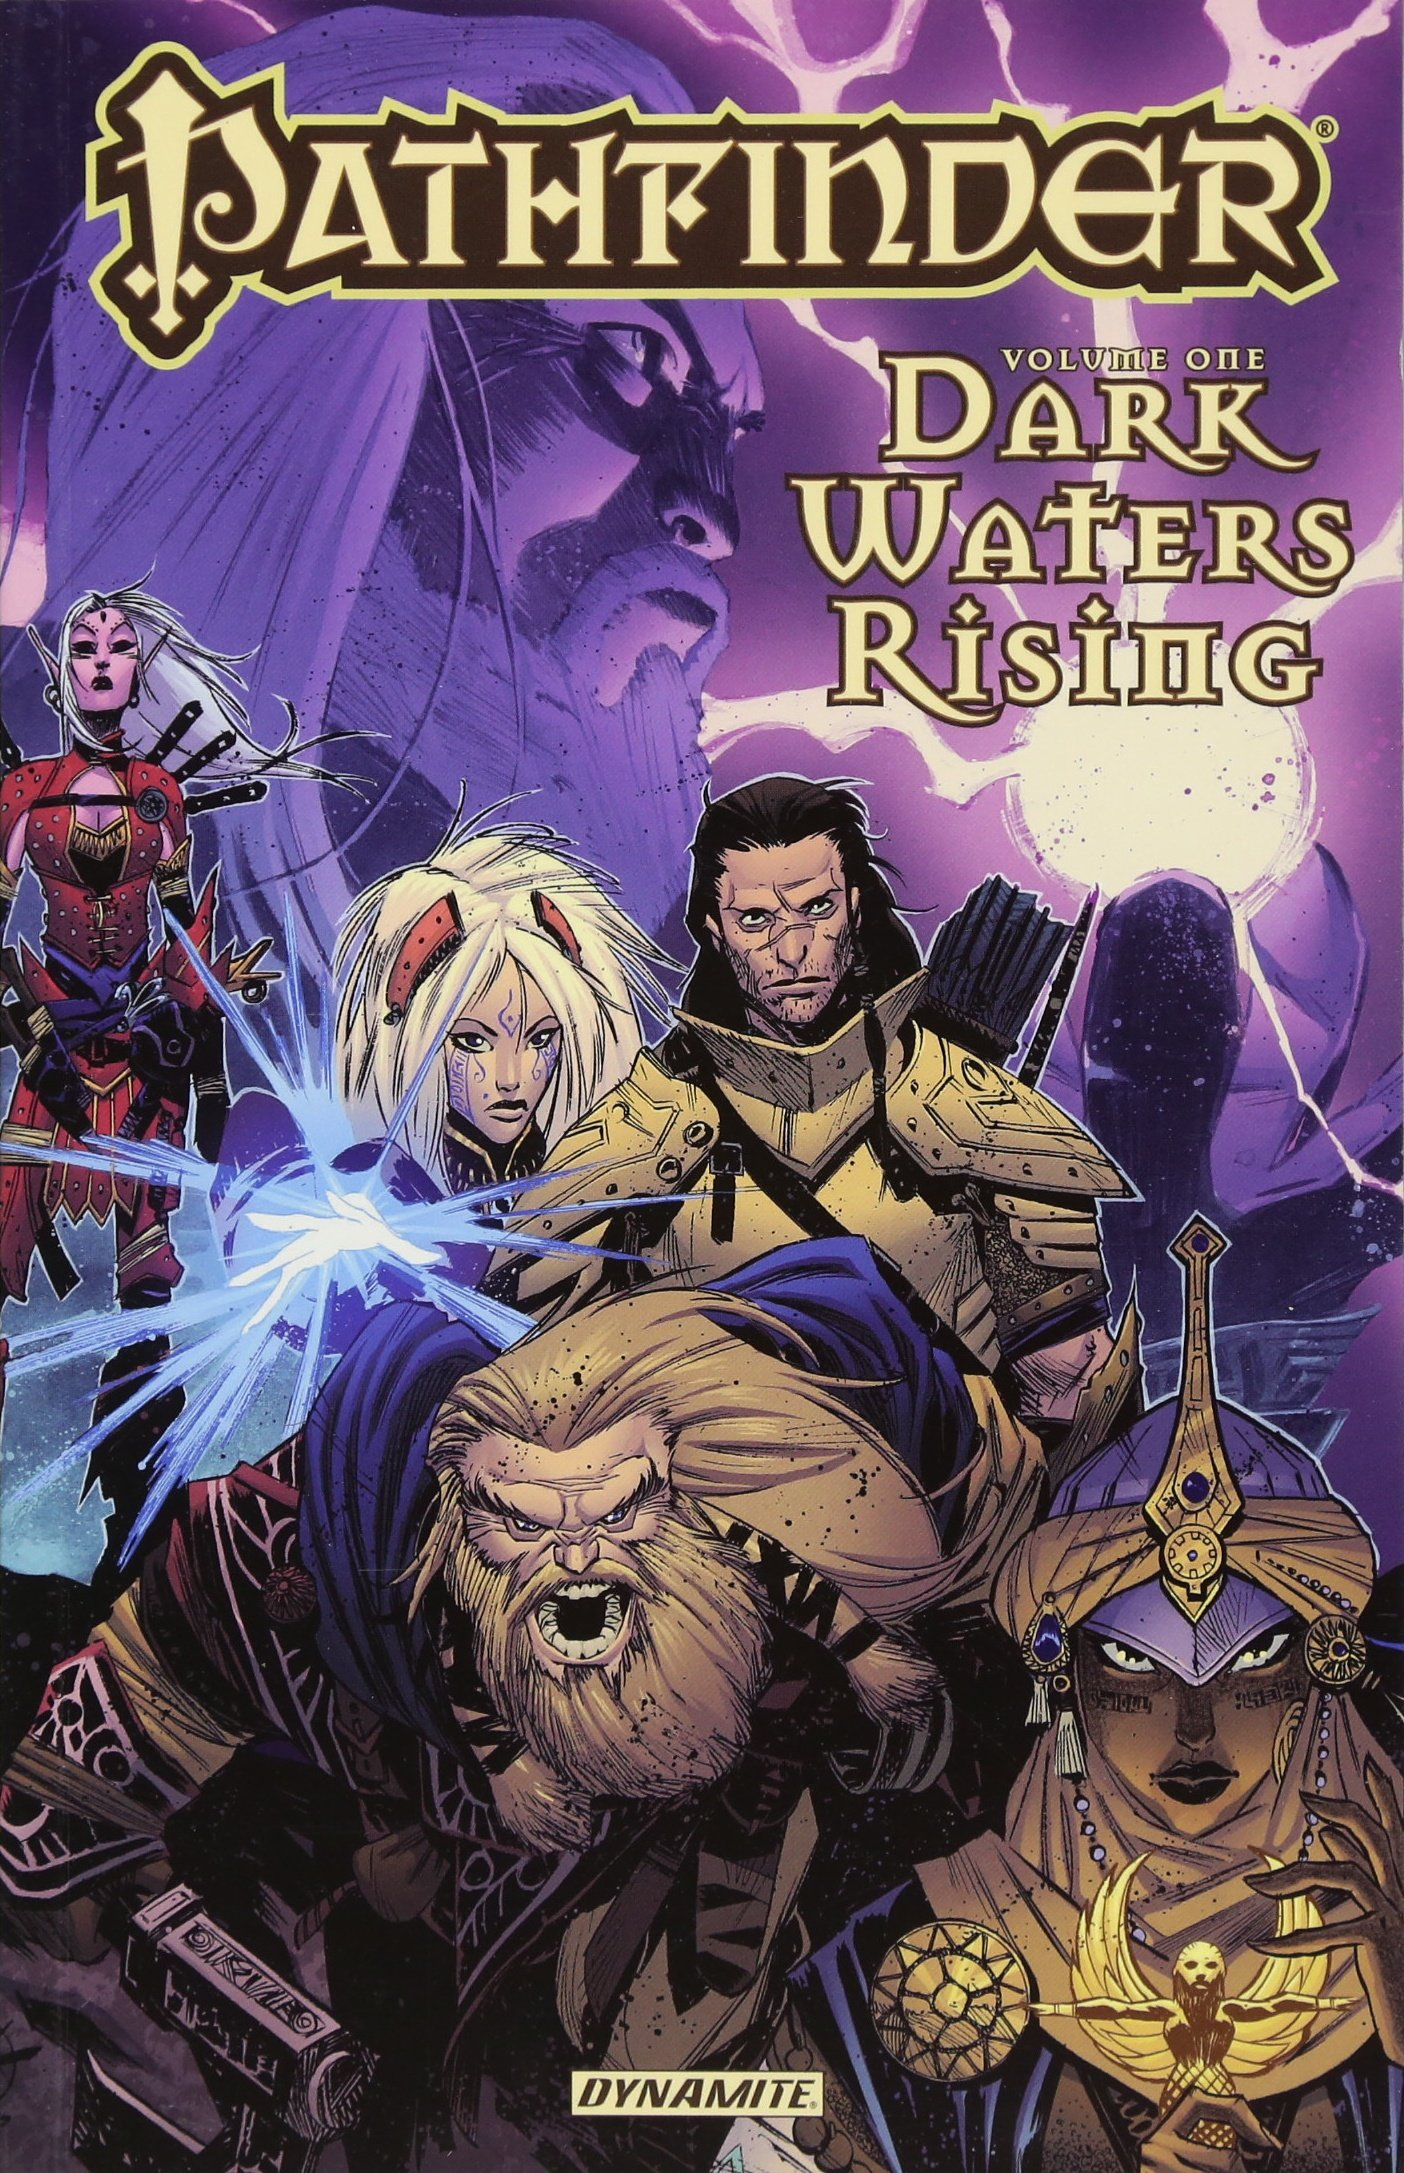 Pathfinder Vol  1: Dark Waters Rising: Jim Zub, Andrew